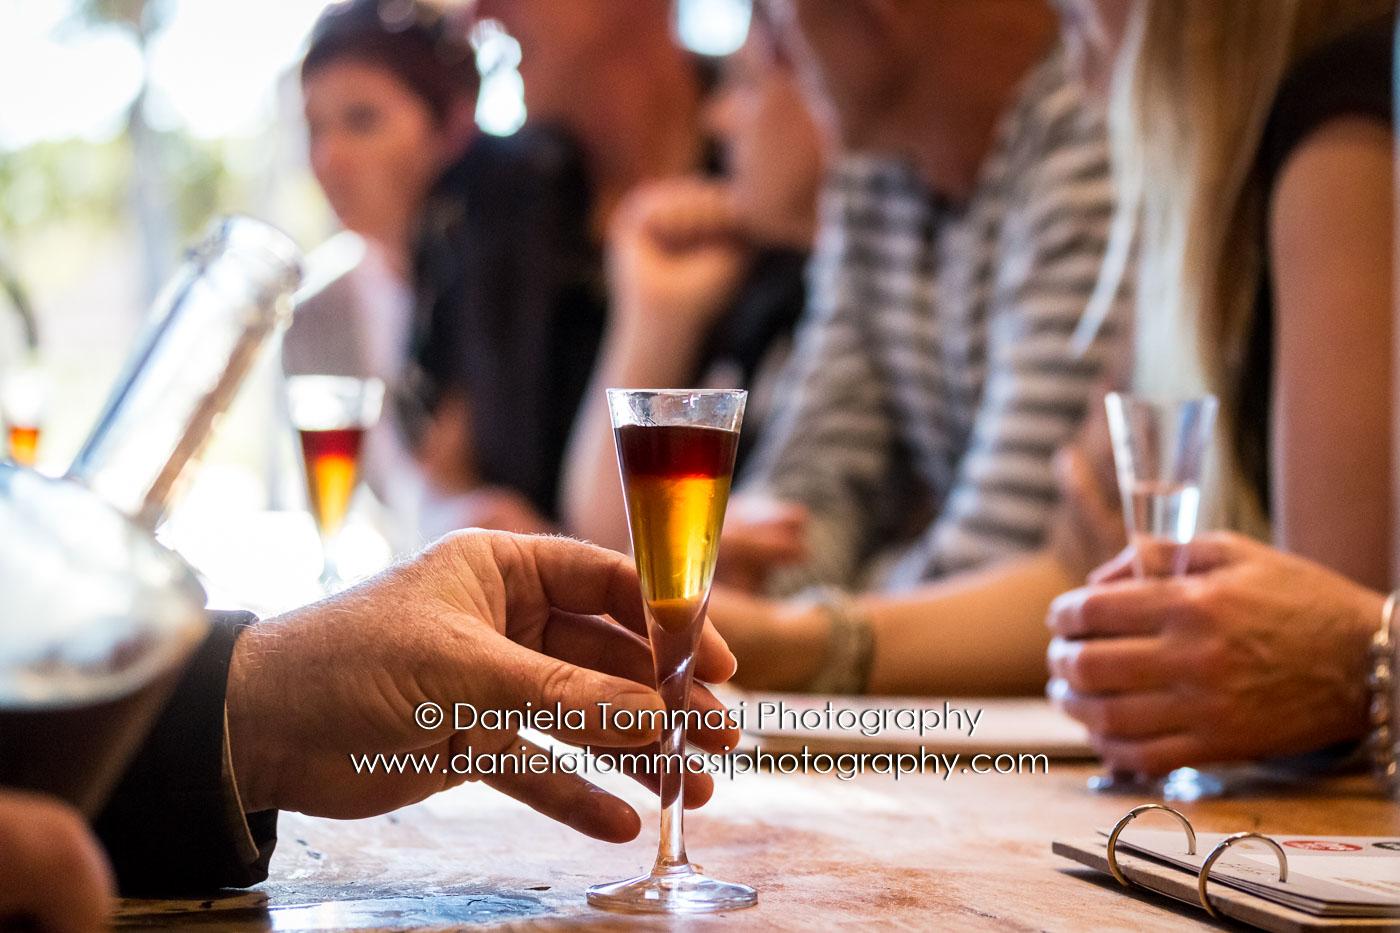 Restaurant-Daniela Tommasi Photography-4